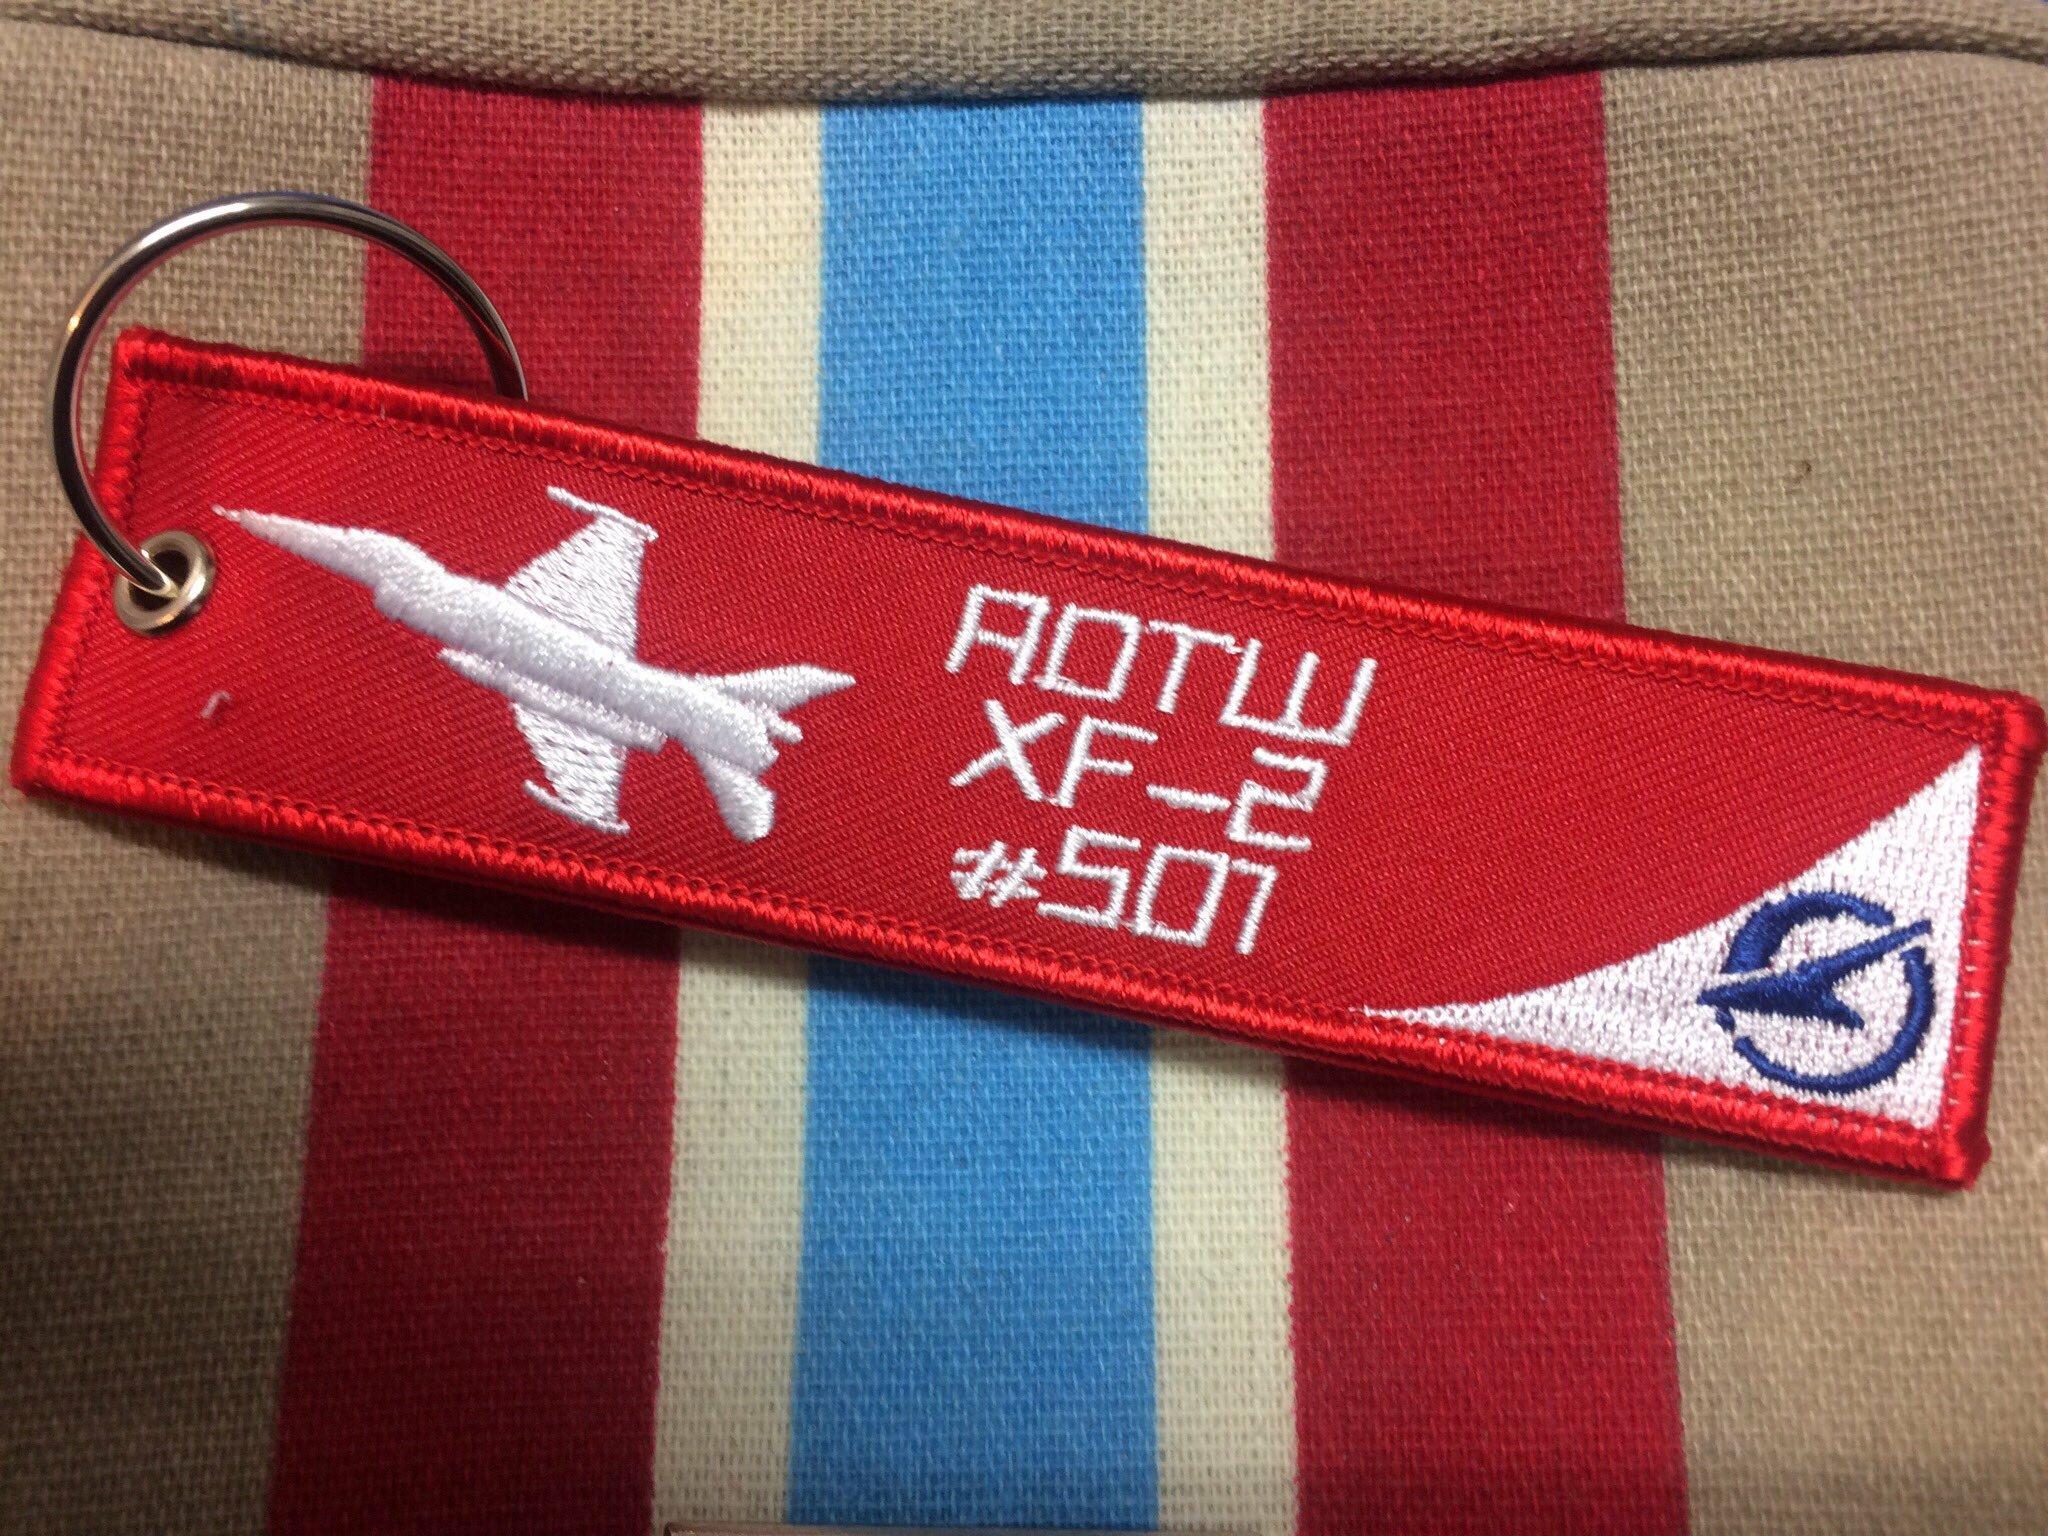 XF-2 #501 飛行開発実験団タグキーホルダー